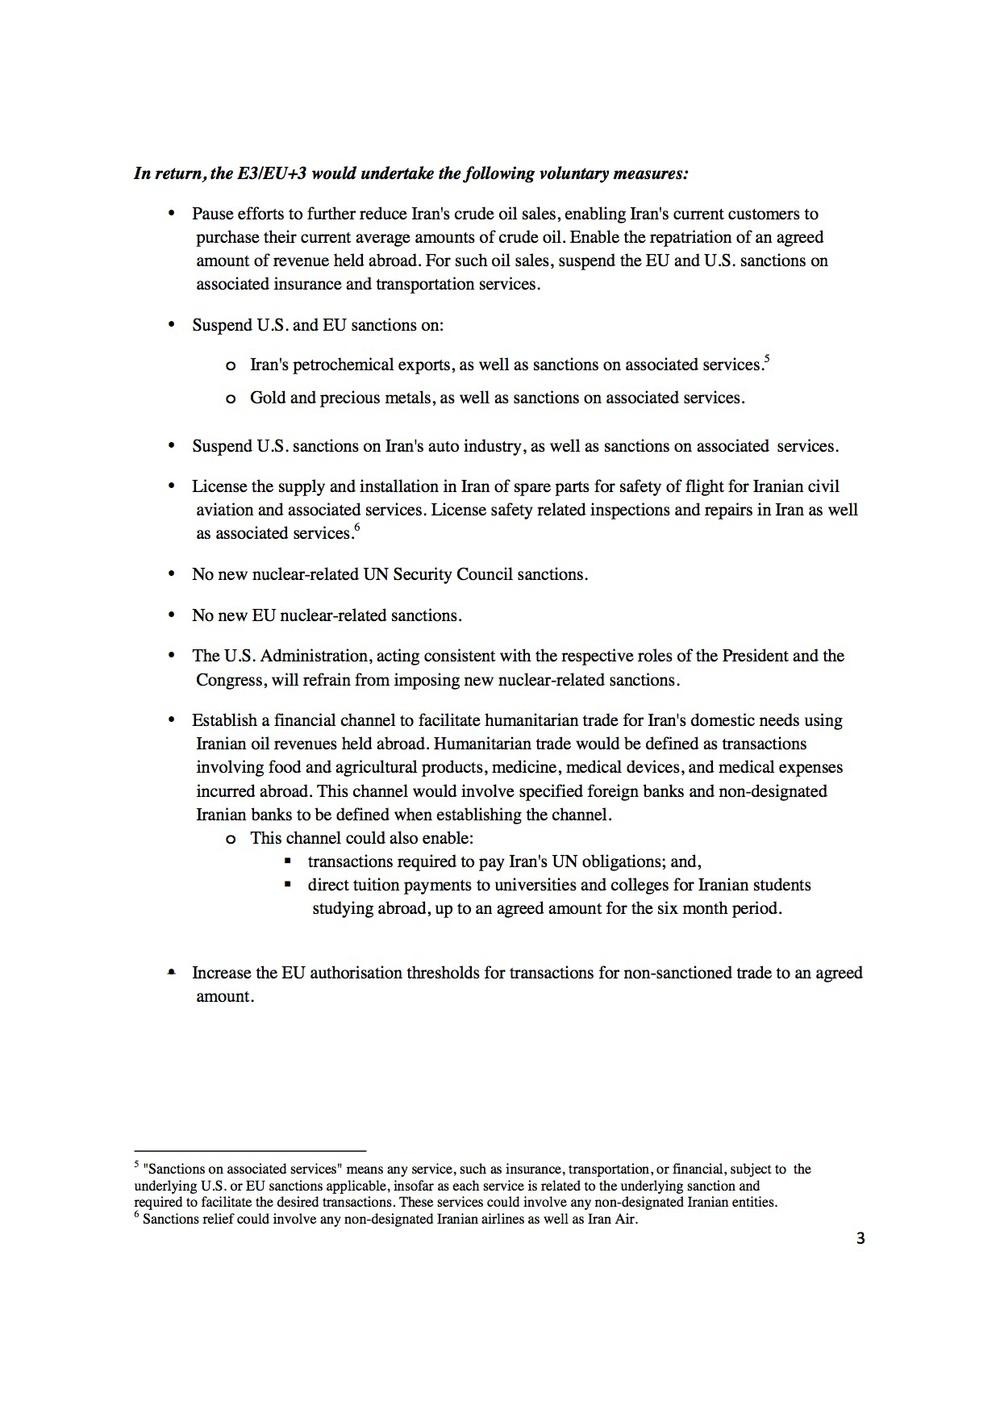 JPOA Page 3.jpg